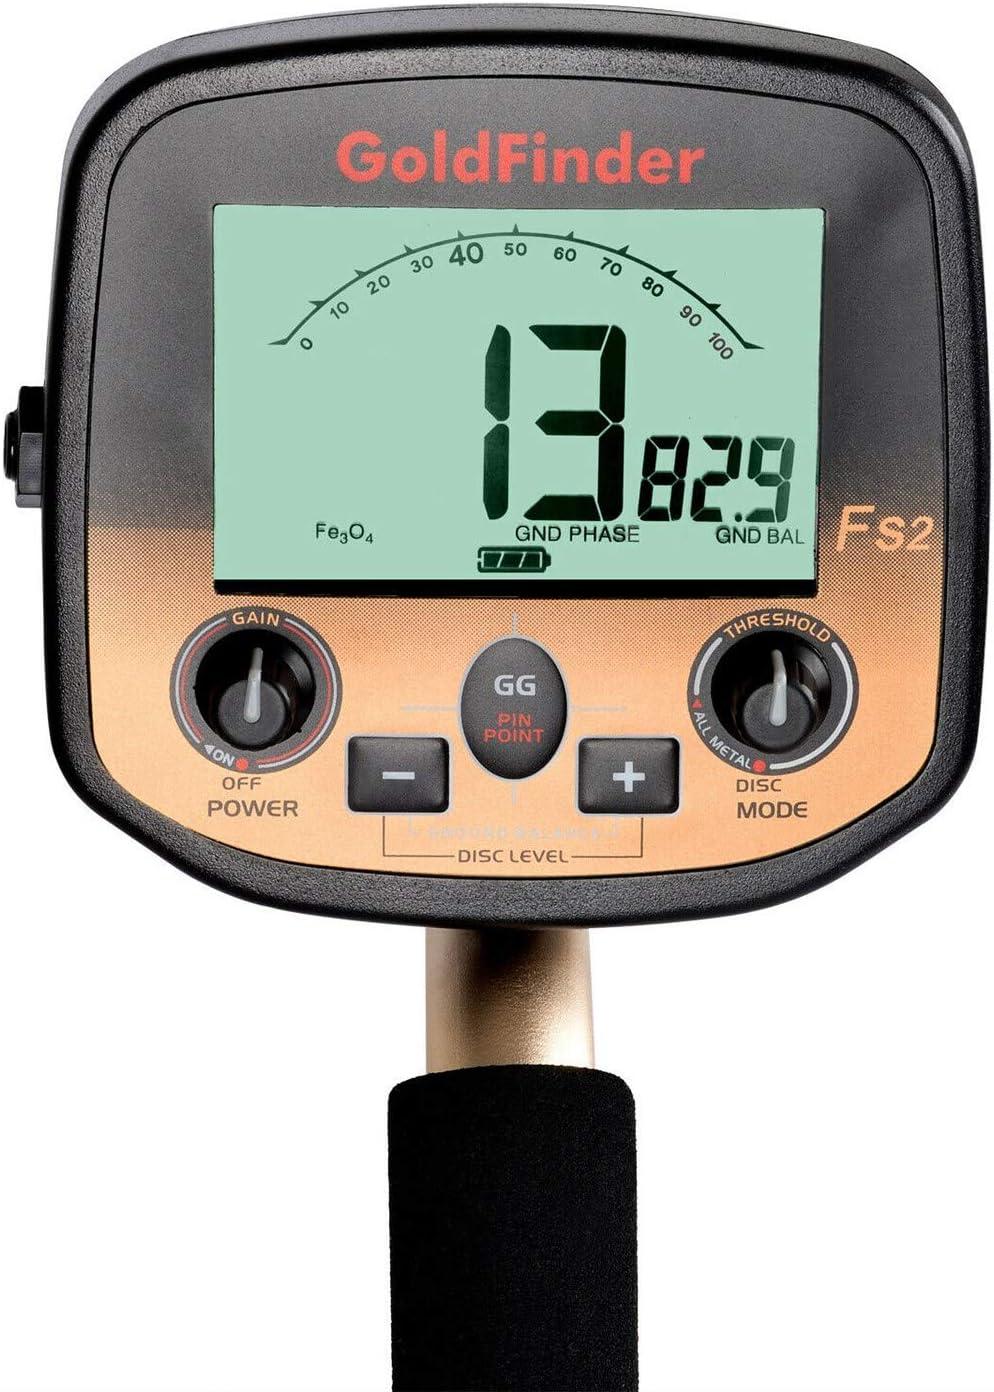 Xigeapg FS2 Underground Metal Detector Handheld Professional High Sensitivity Scanner 1 Set